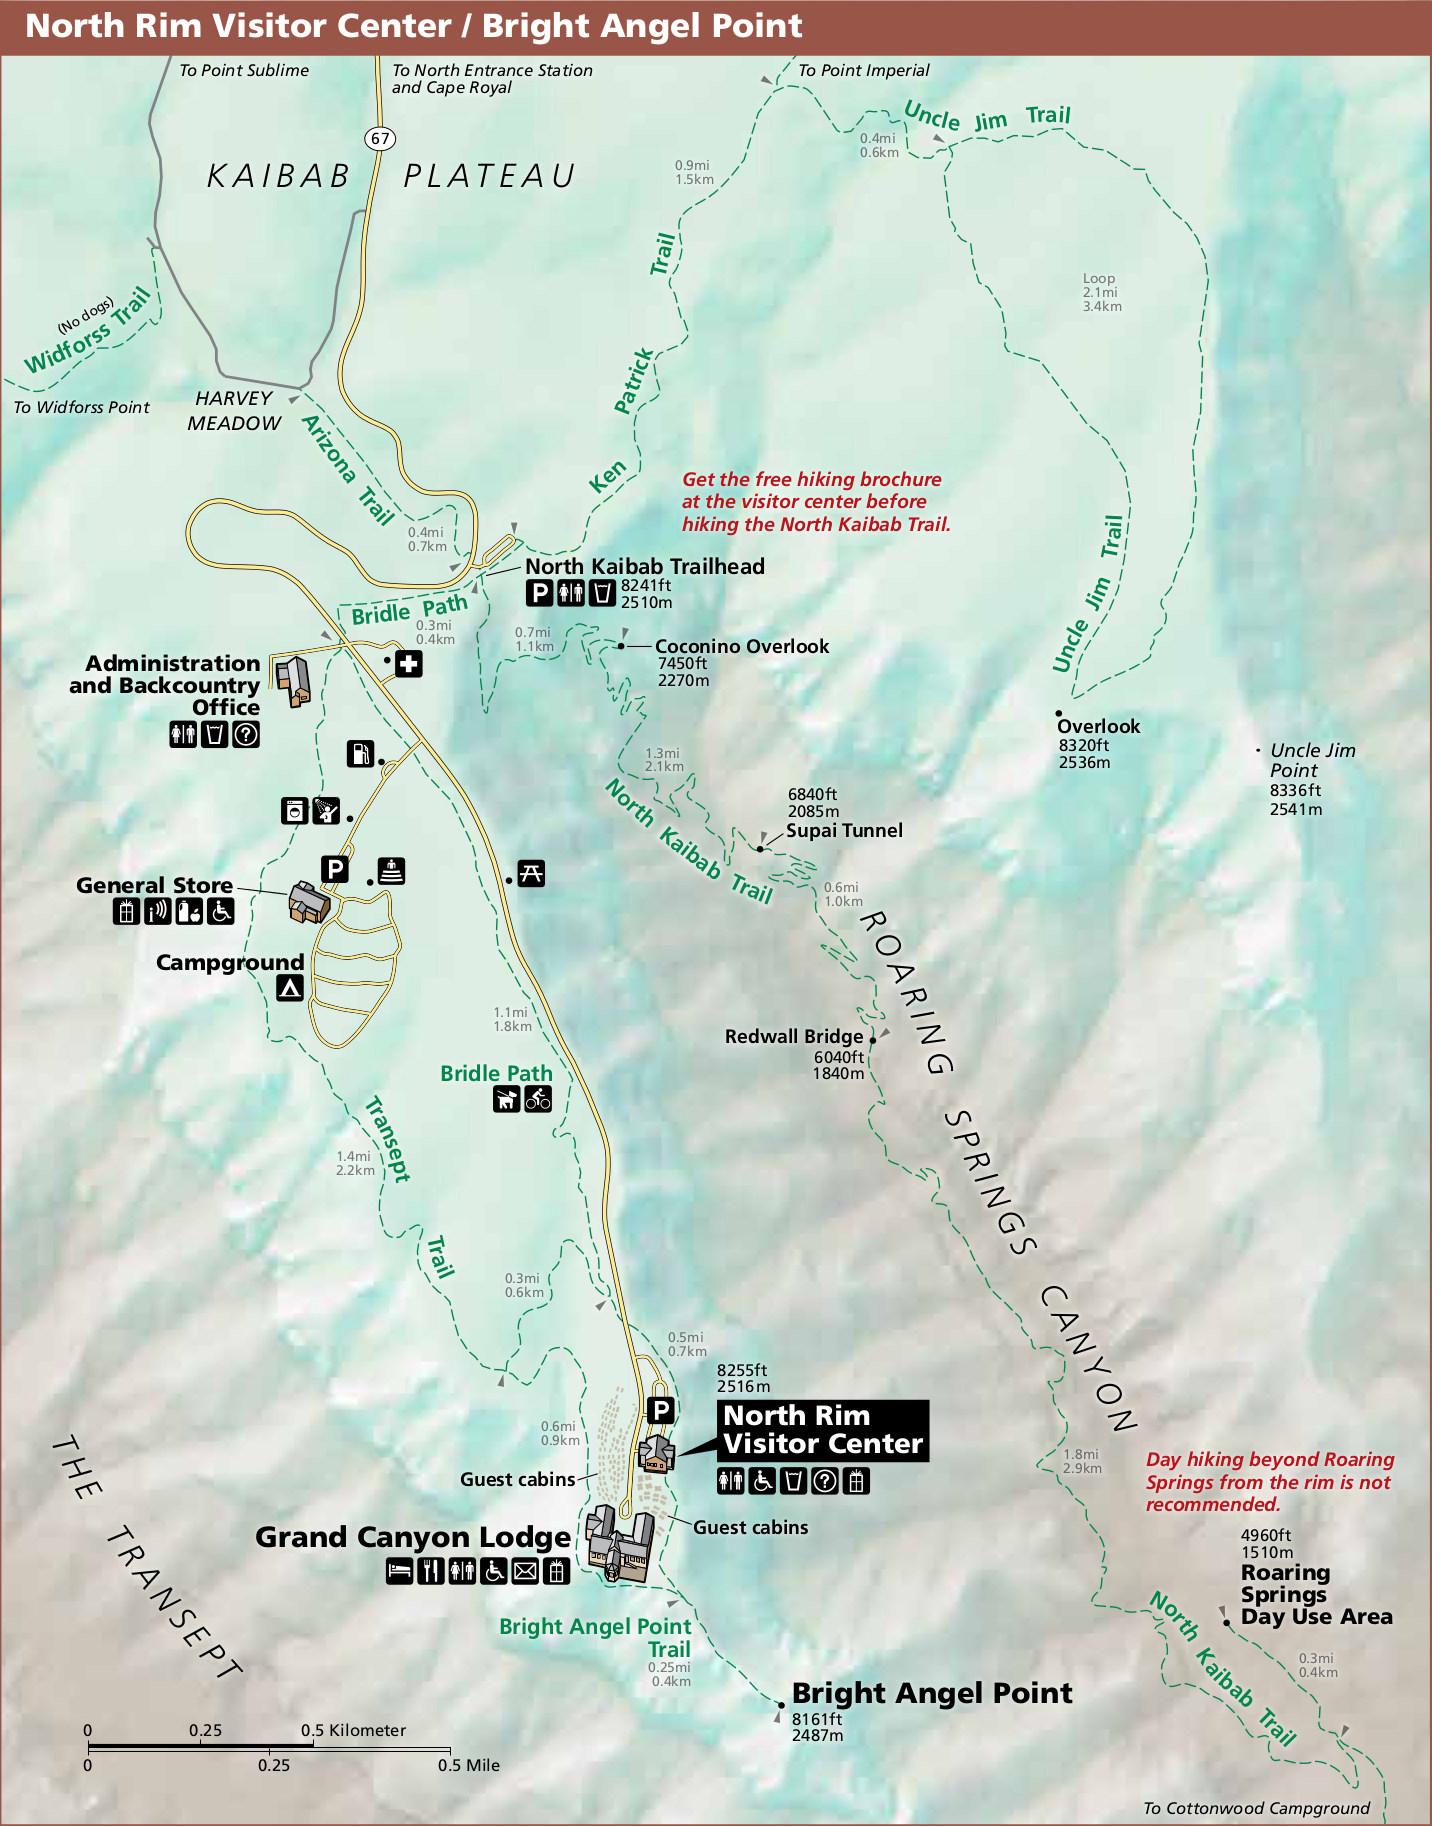 north rim grand canyon map File Nps Grand Canyon North Rim Visitor Center Map Jpg Wikimedia north rim grand canyon map